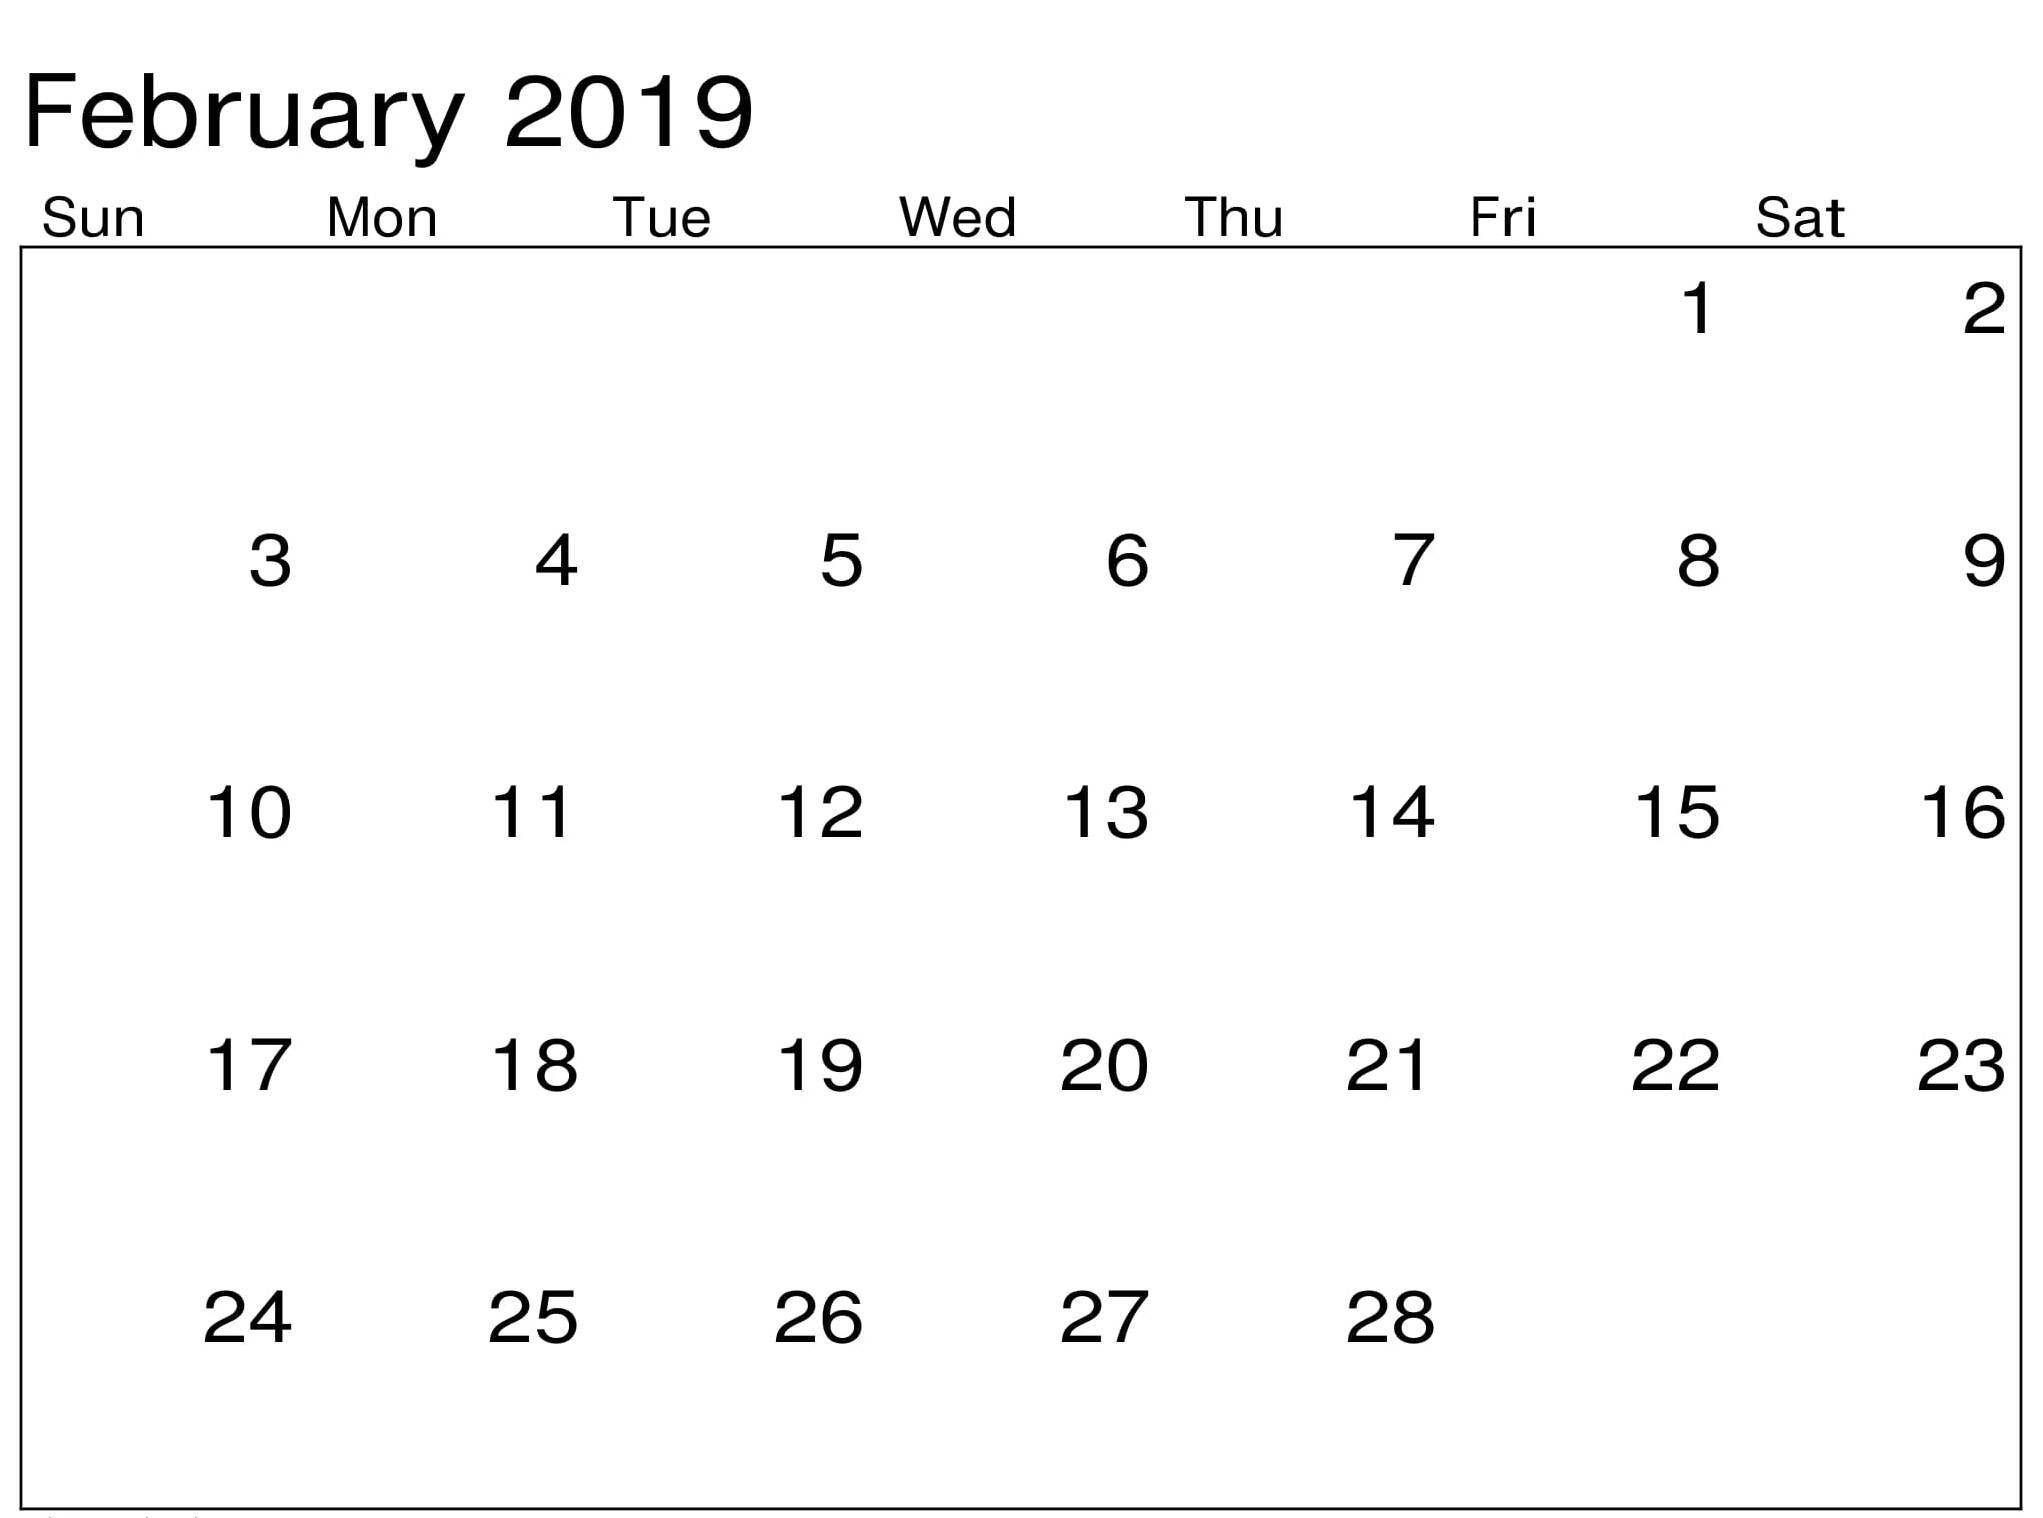 Printable Calendar February 2019 PDF february february2019 2019februarycalendar